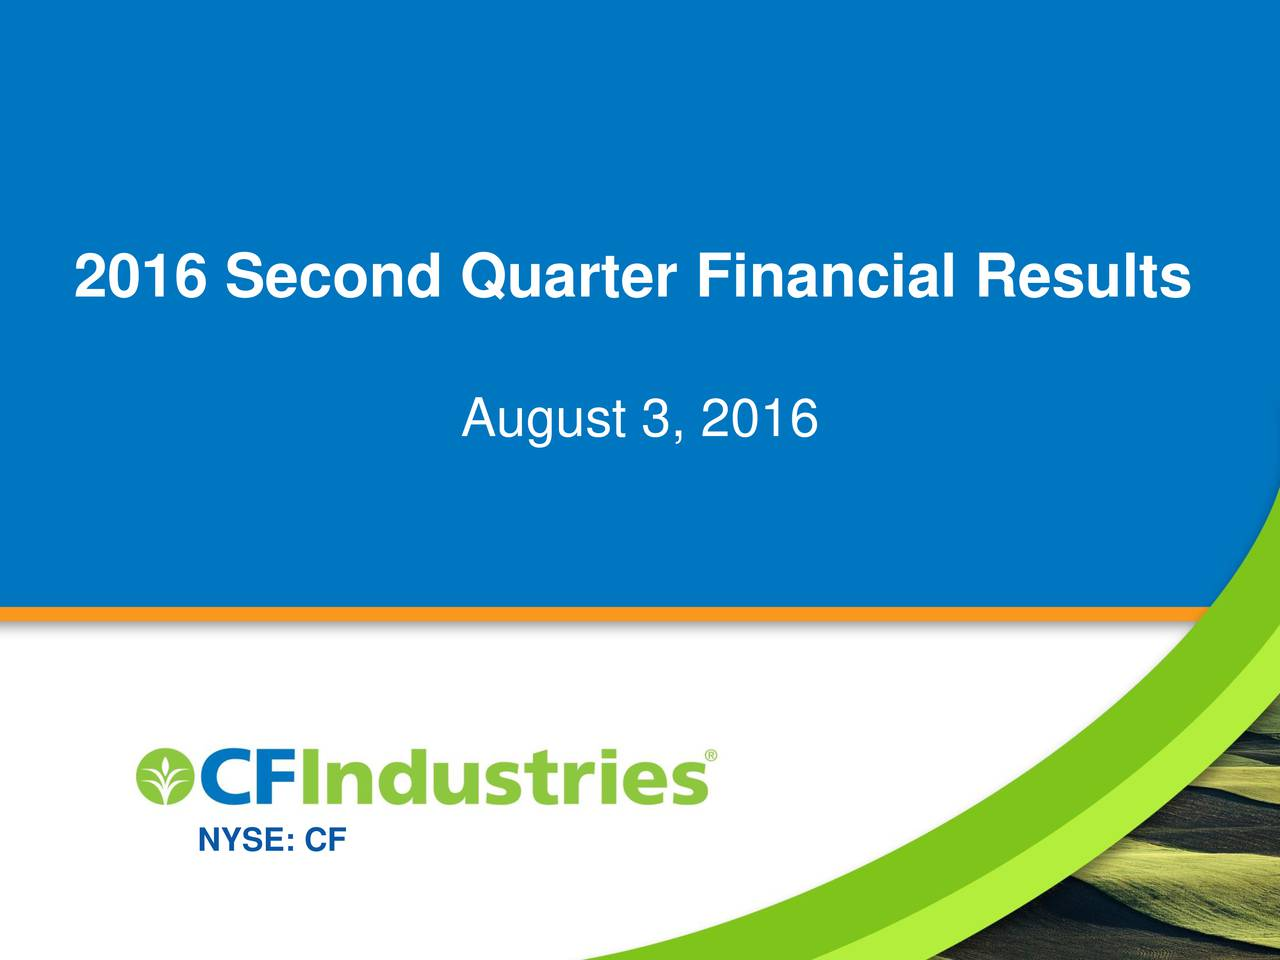 August 3, 2016 NYSE: CF